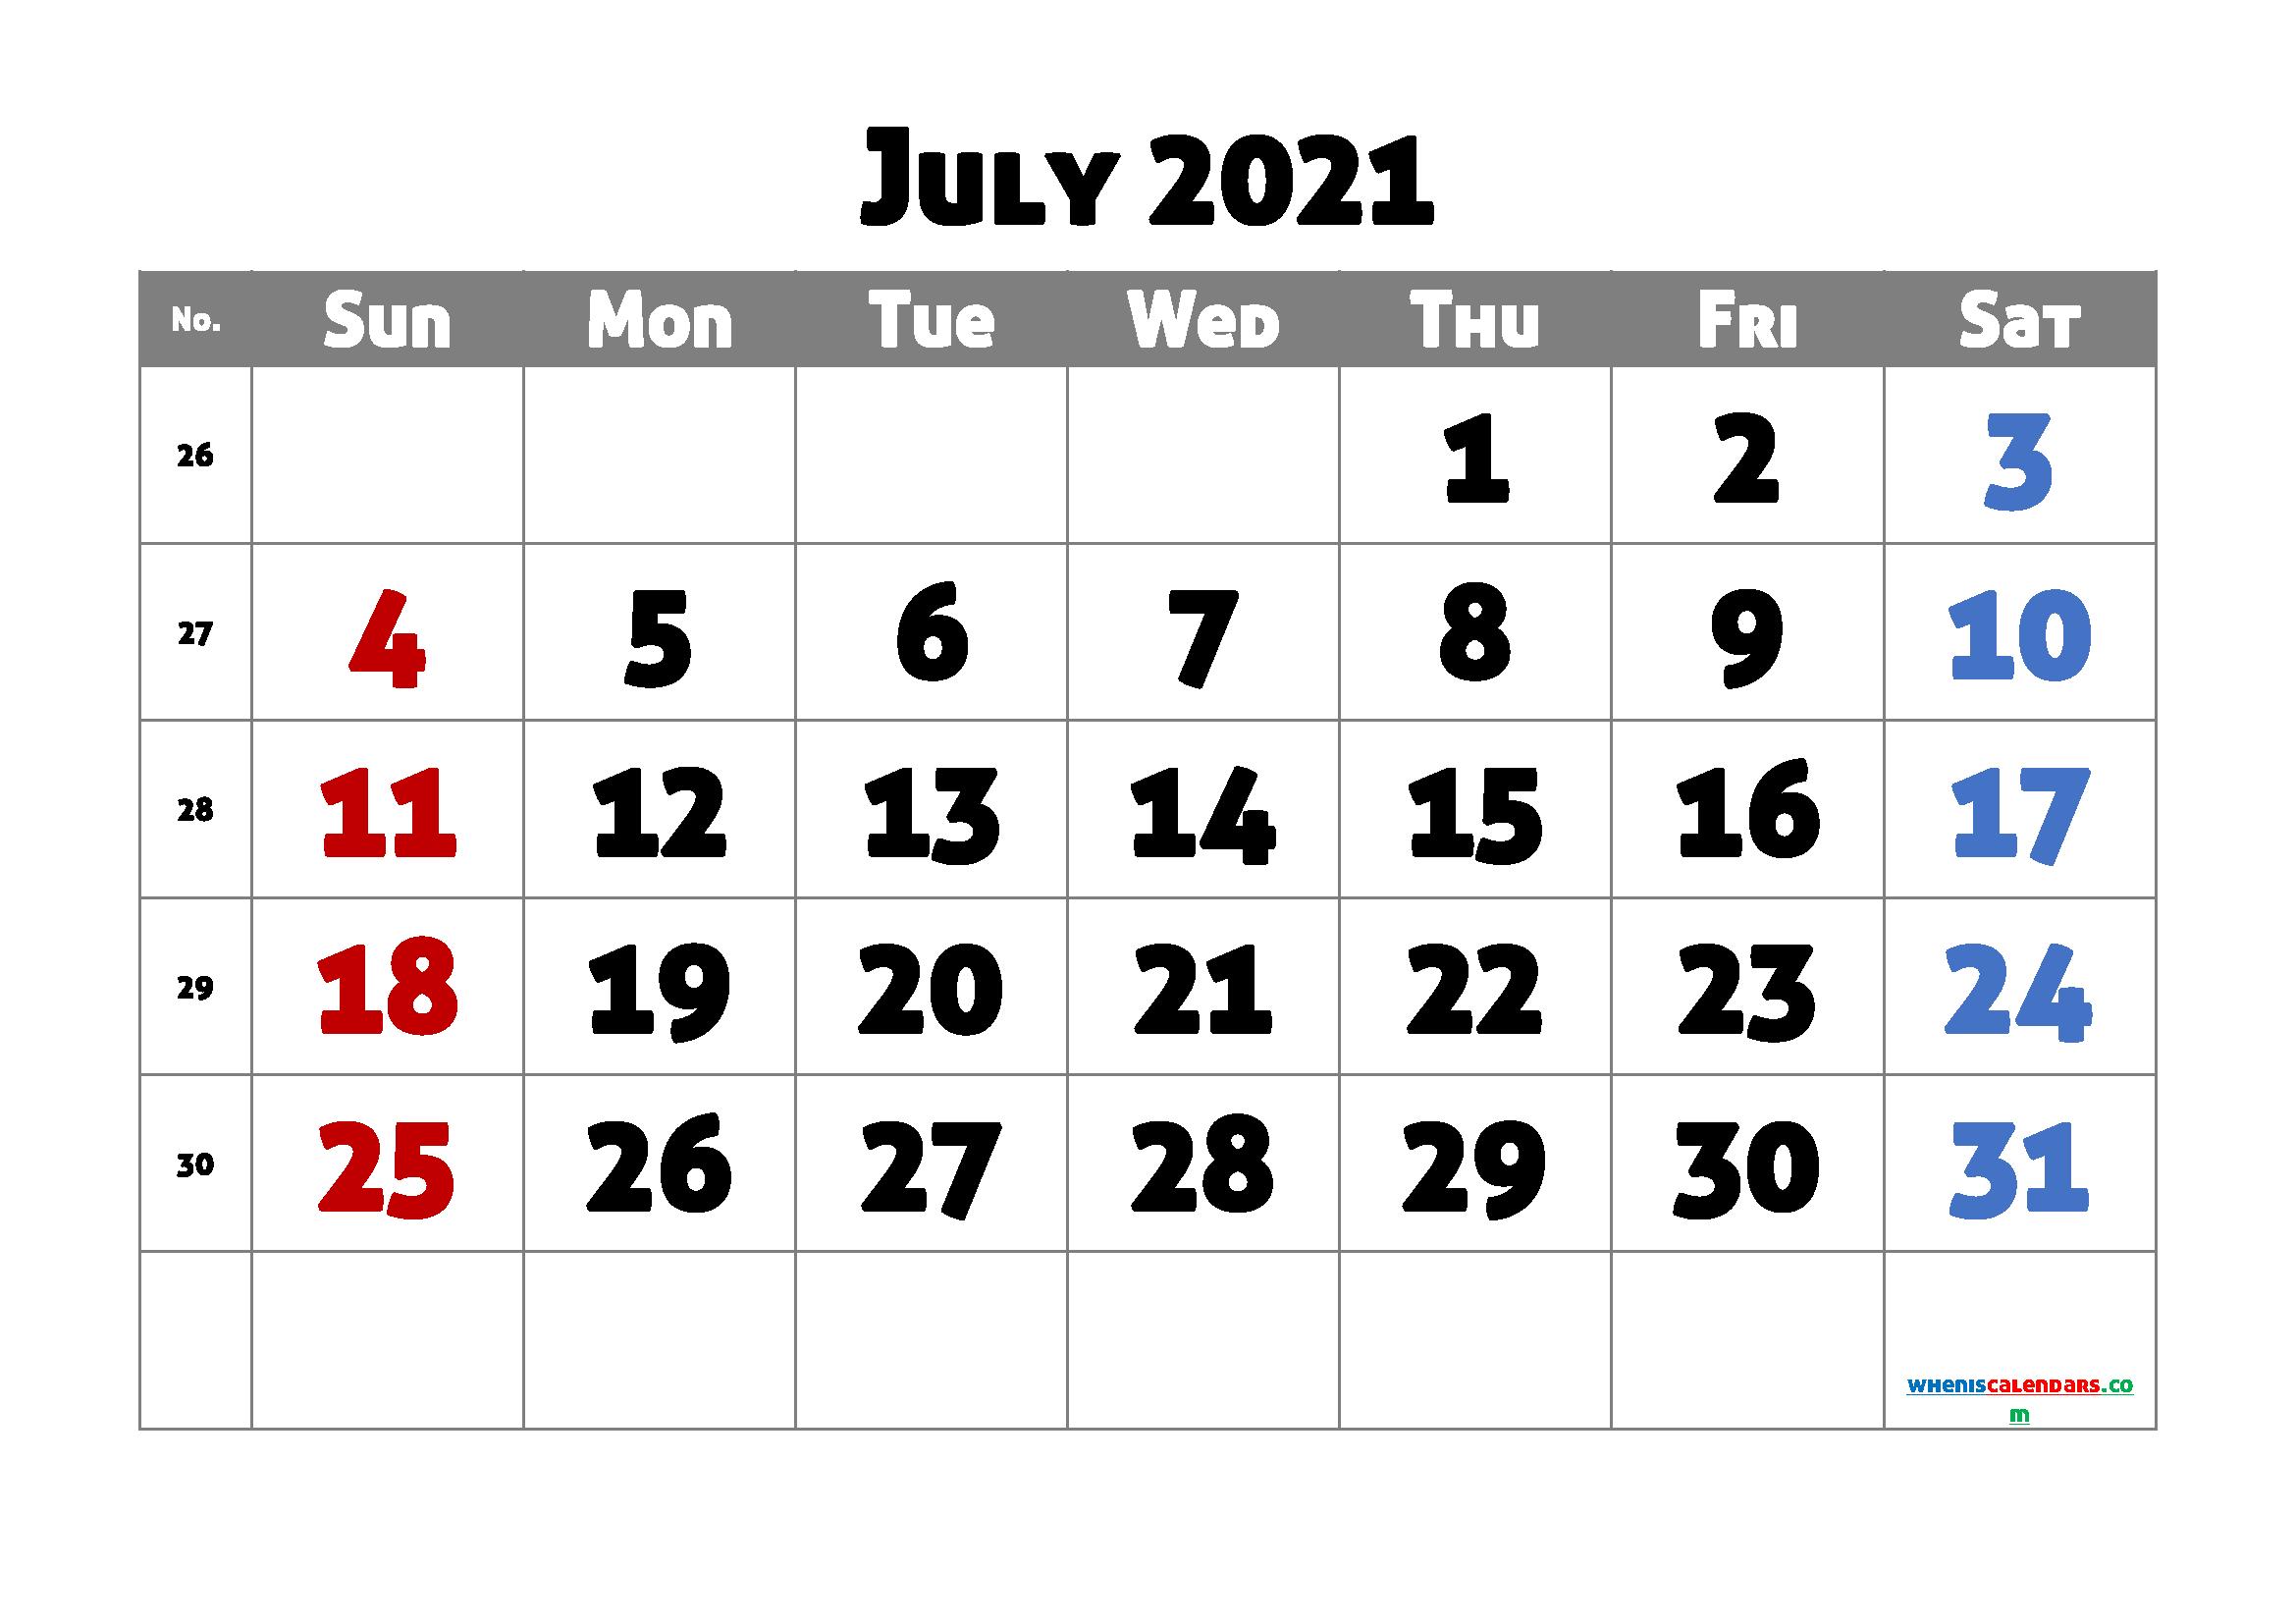 July 2021 Printable Calendar Free